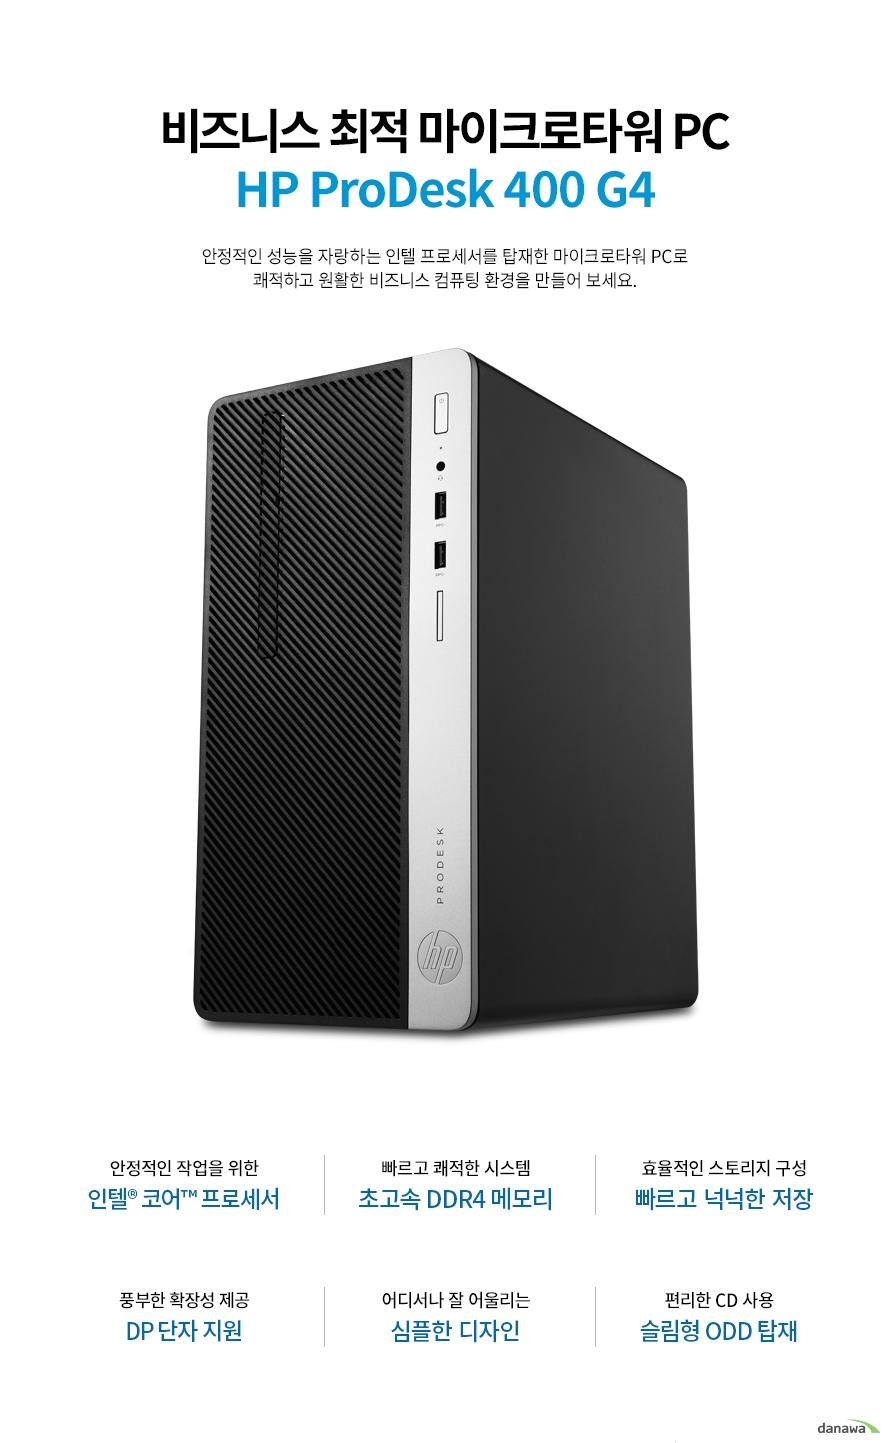 HP 프로데스크 400 G4 MT 2HB20PA (SSD 250GB + 1TB)[촬영상품]